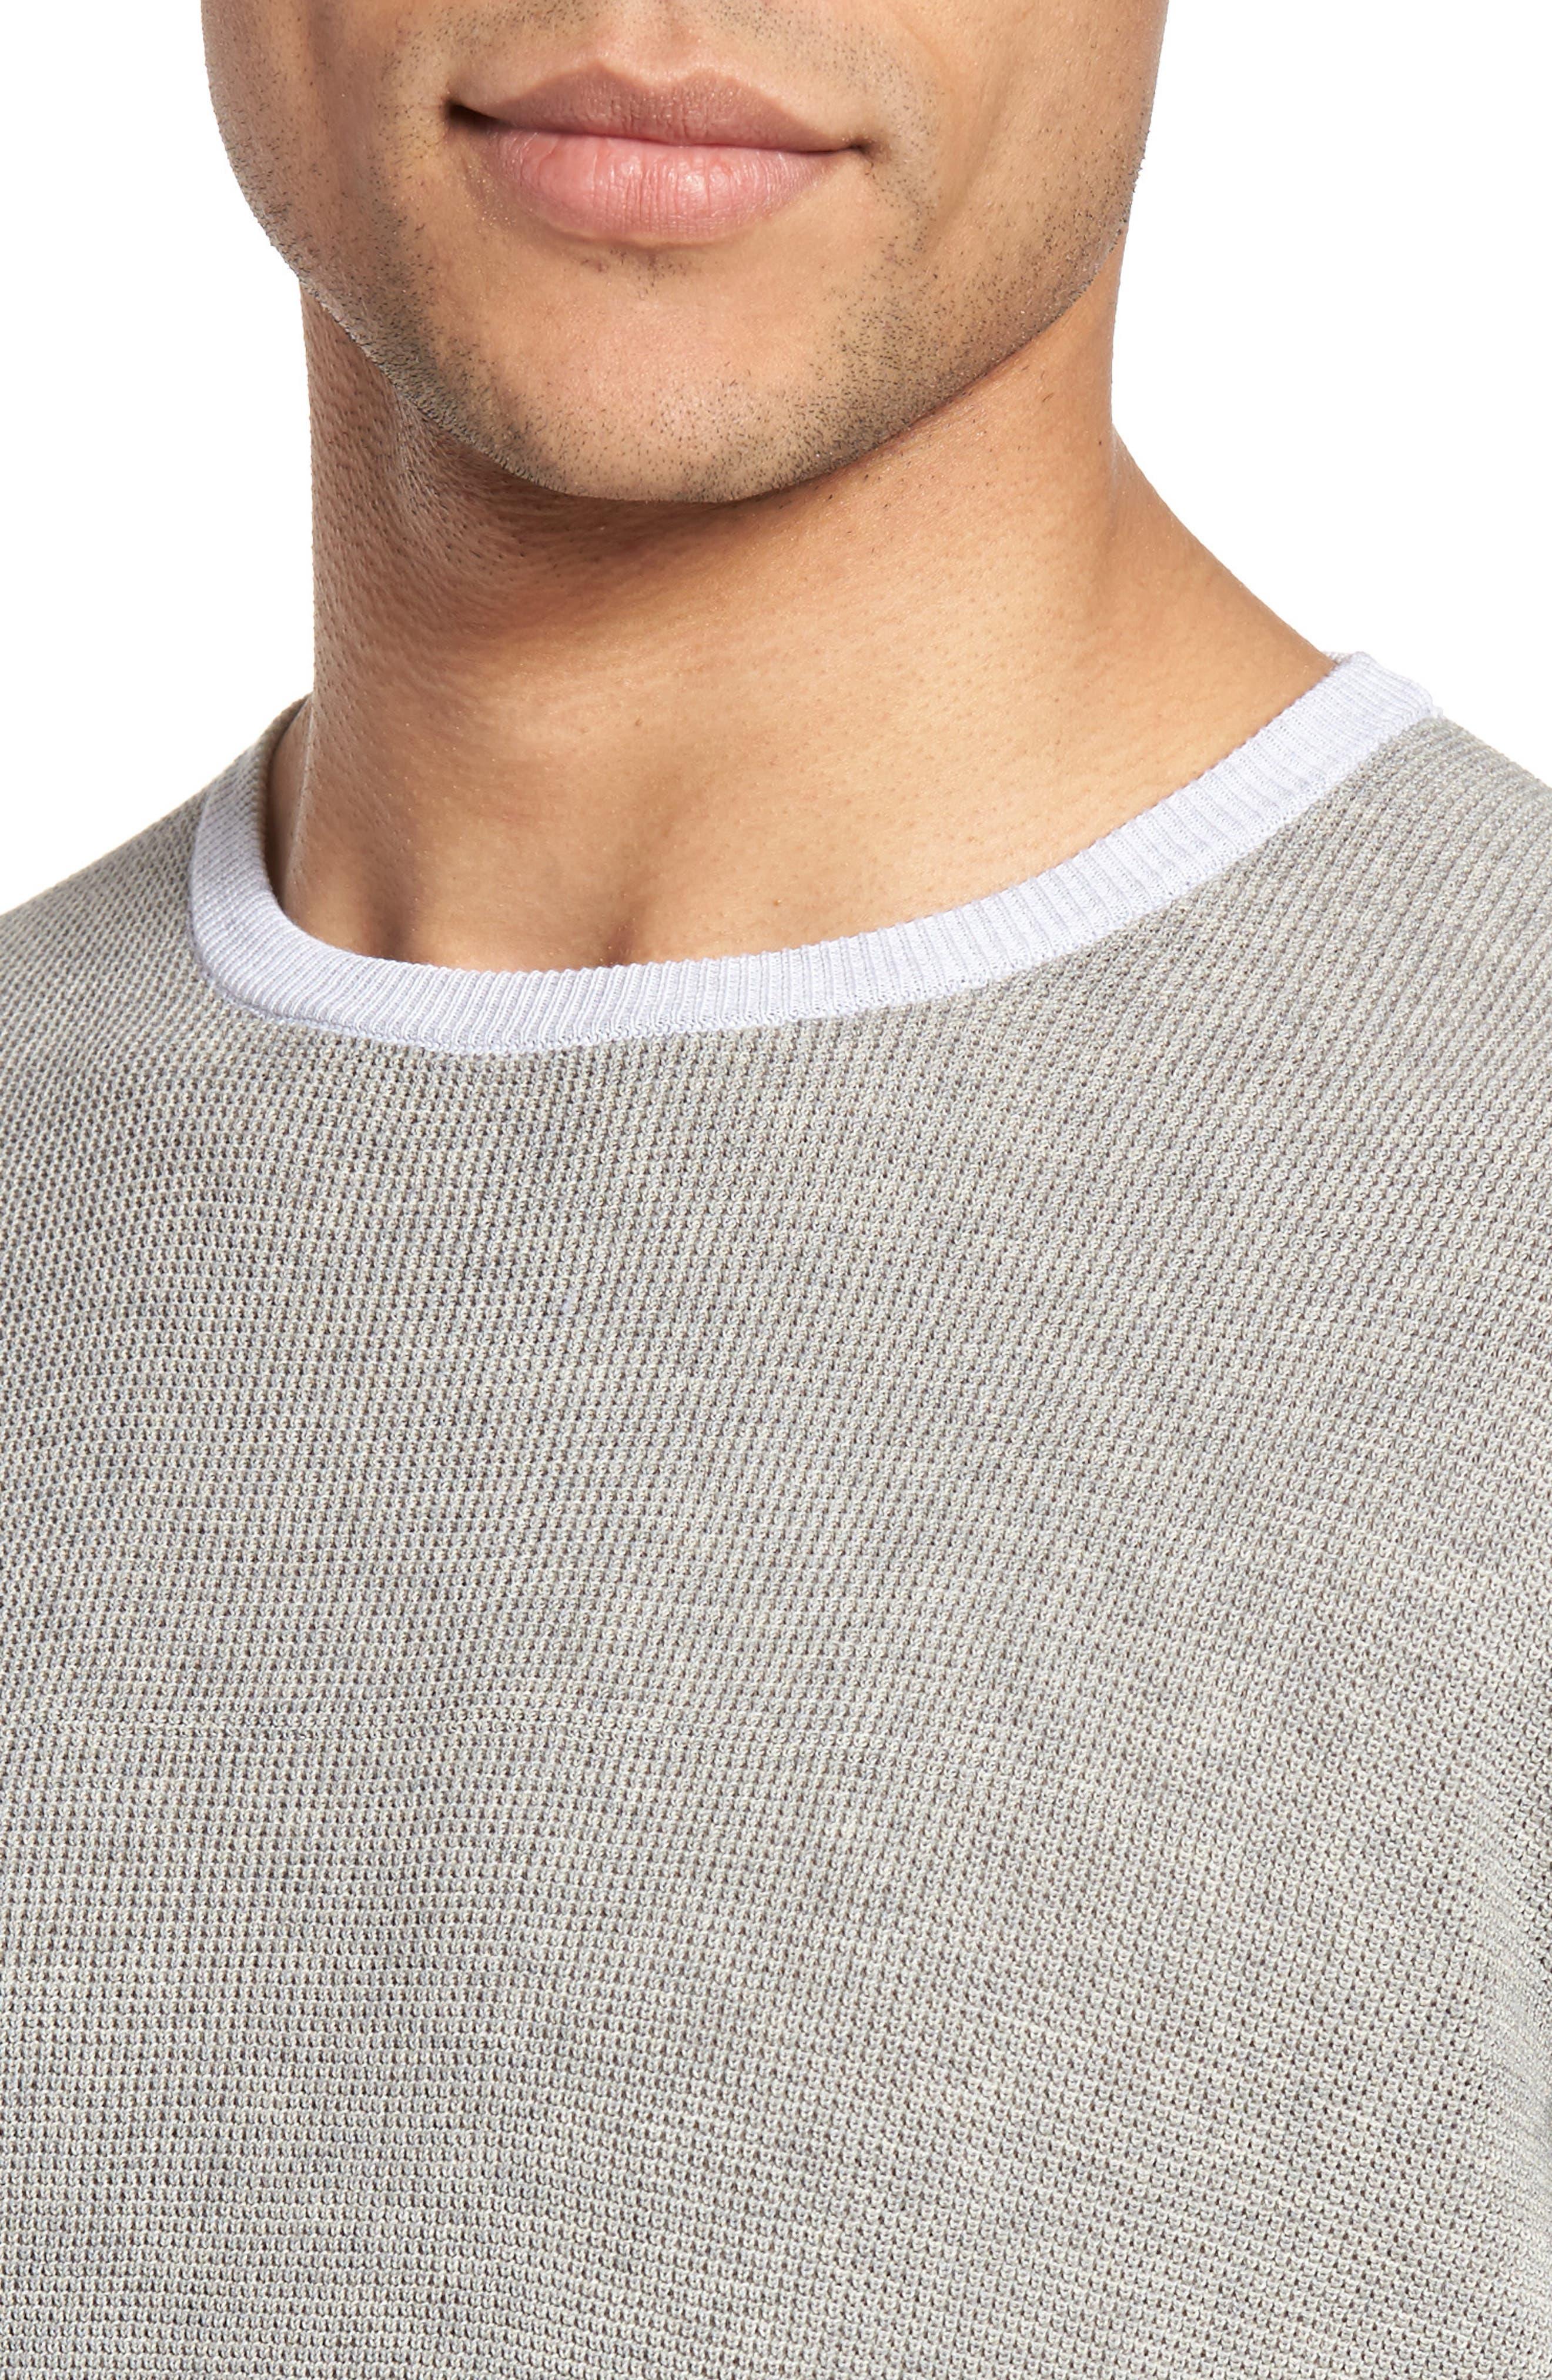 Boxwood Sweater,                             Alternate thumbnail 4, color,                             020